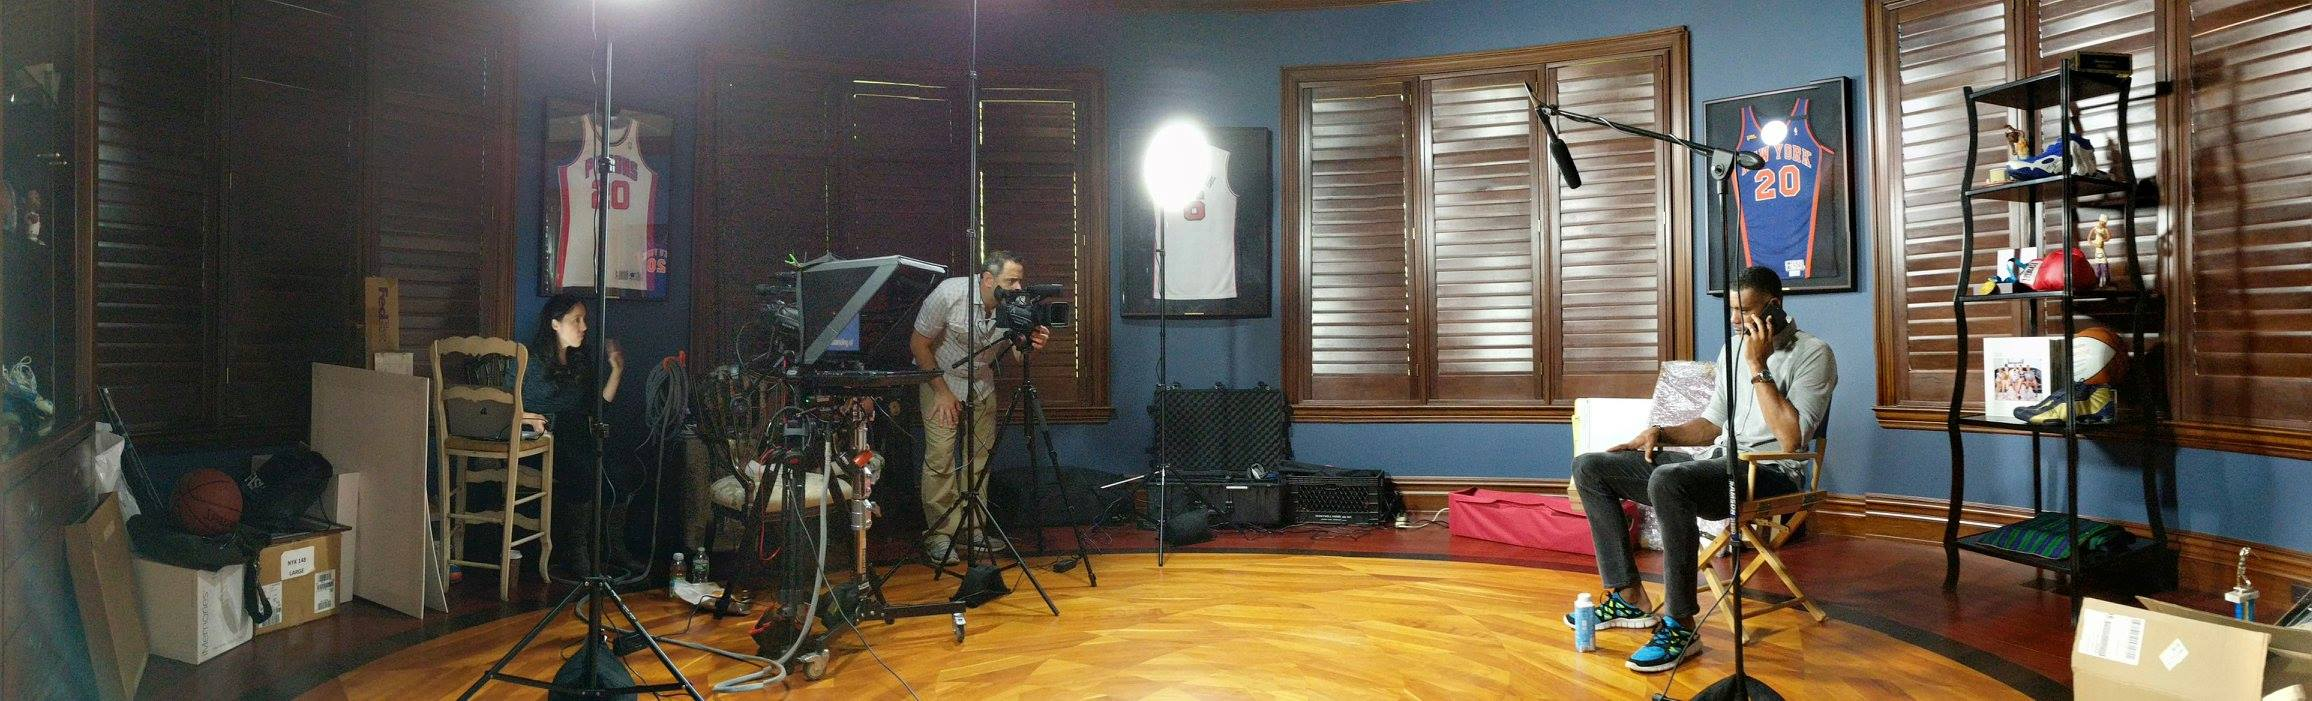 standard camera crew package 4